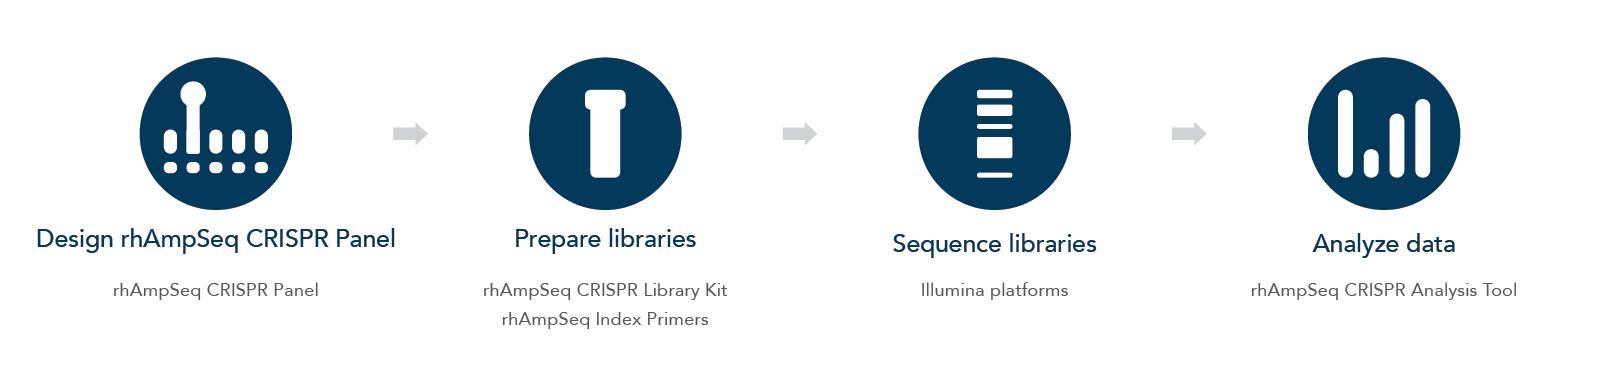 rhAmpSeq CRISPR Workflow and Components